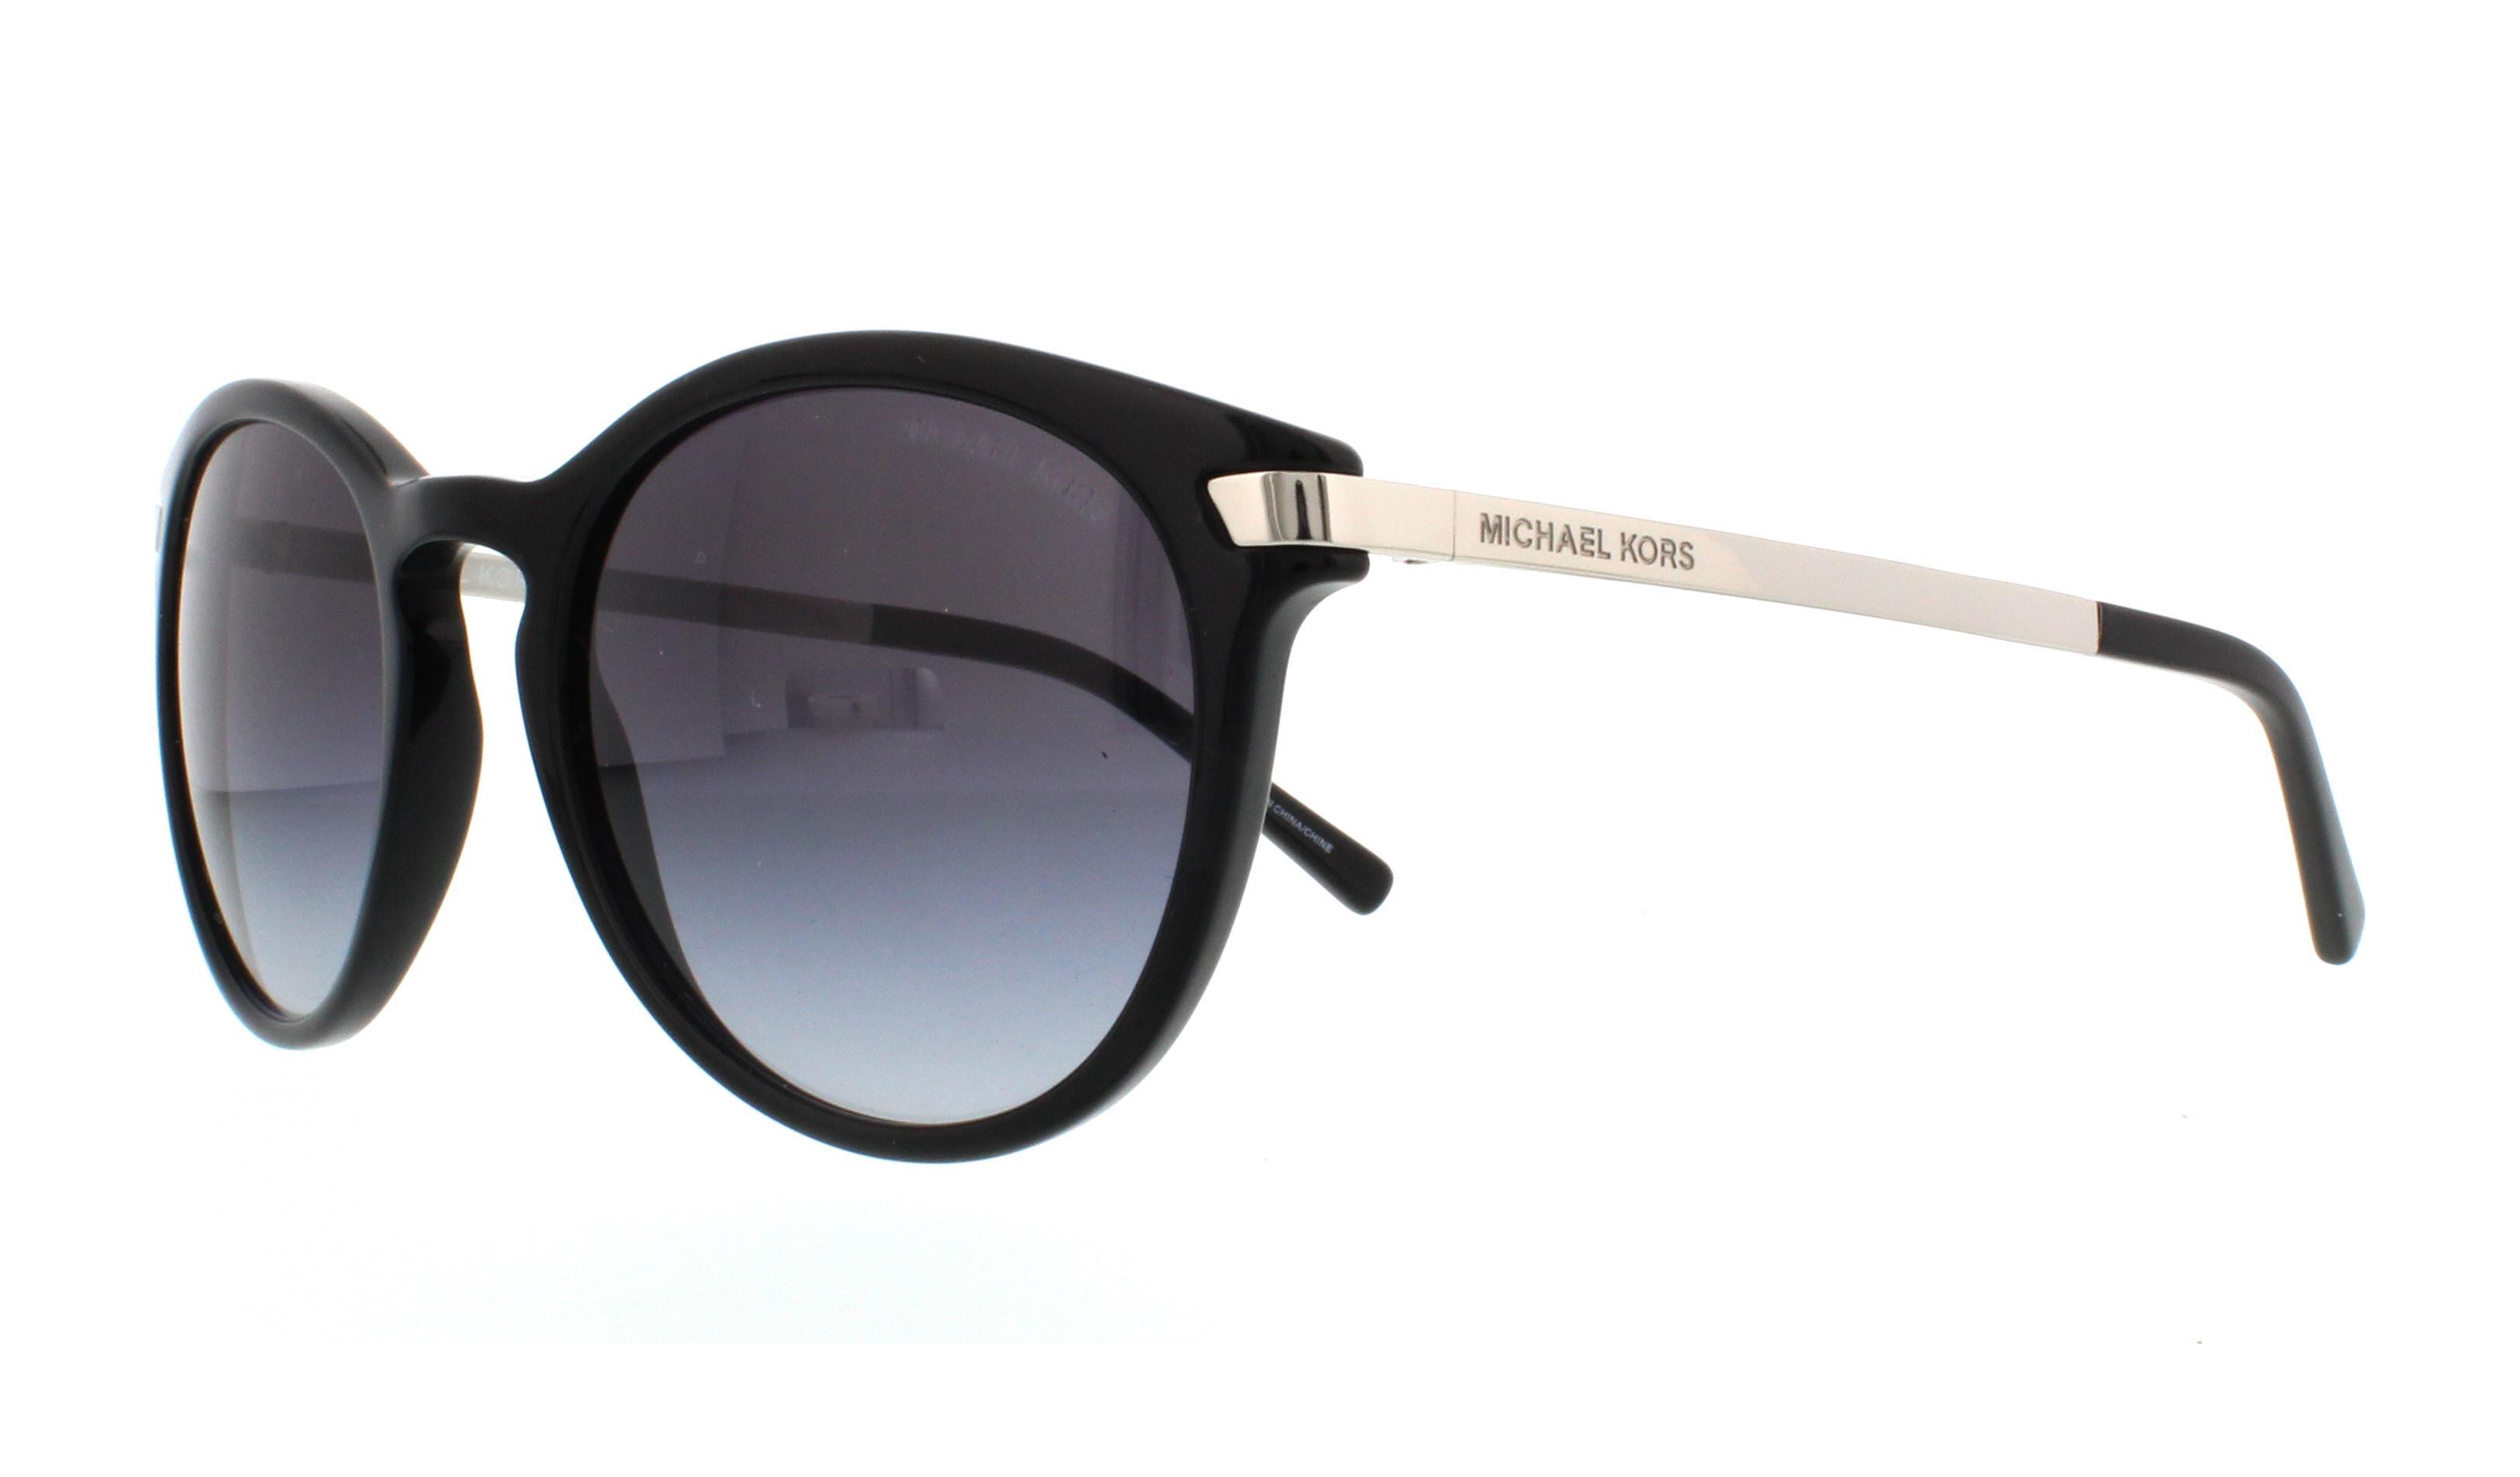 MICHAEL KORS Sunglasses MK2023 ADRIANNA III 316311 Black 53MM ... b9ca3d52e5